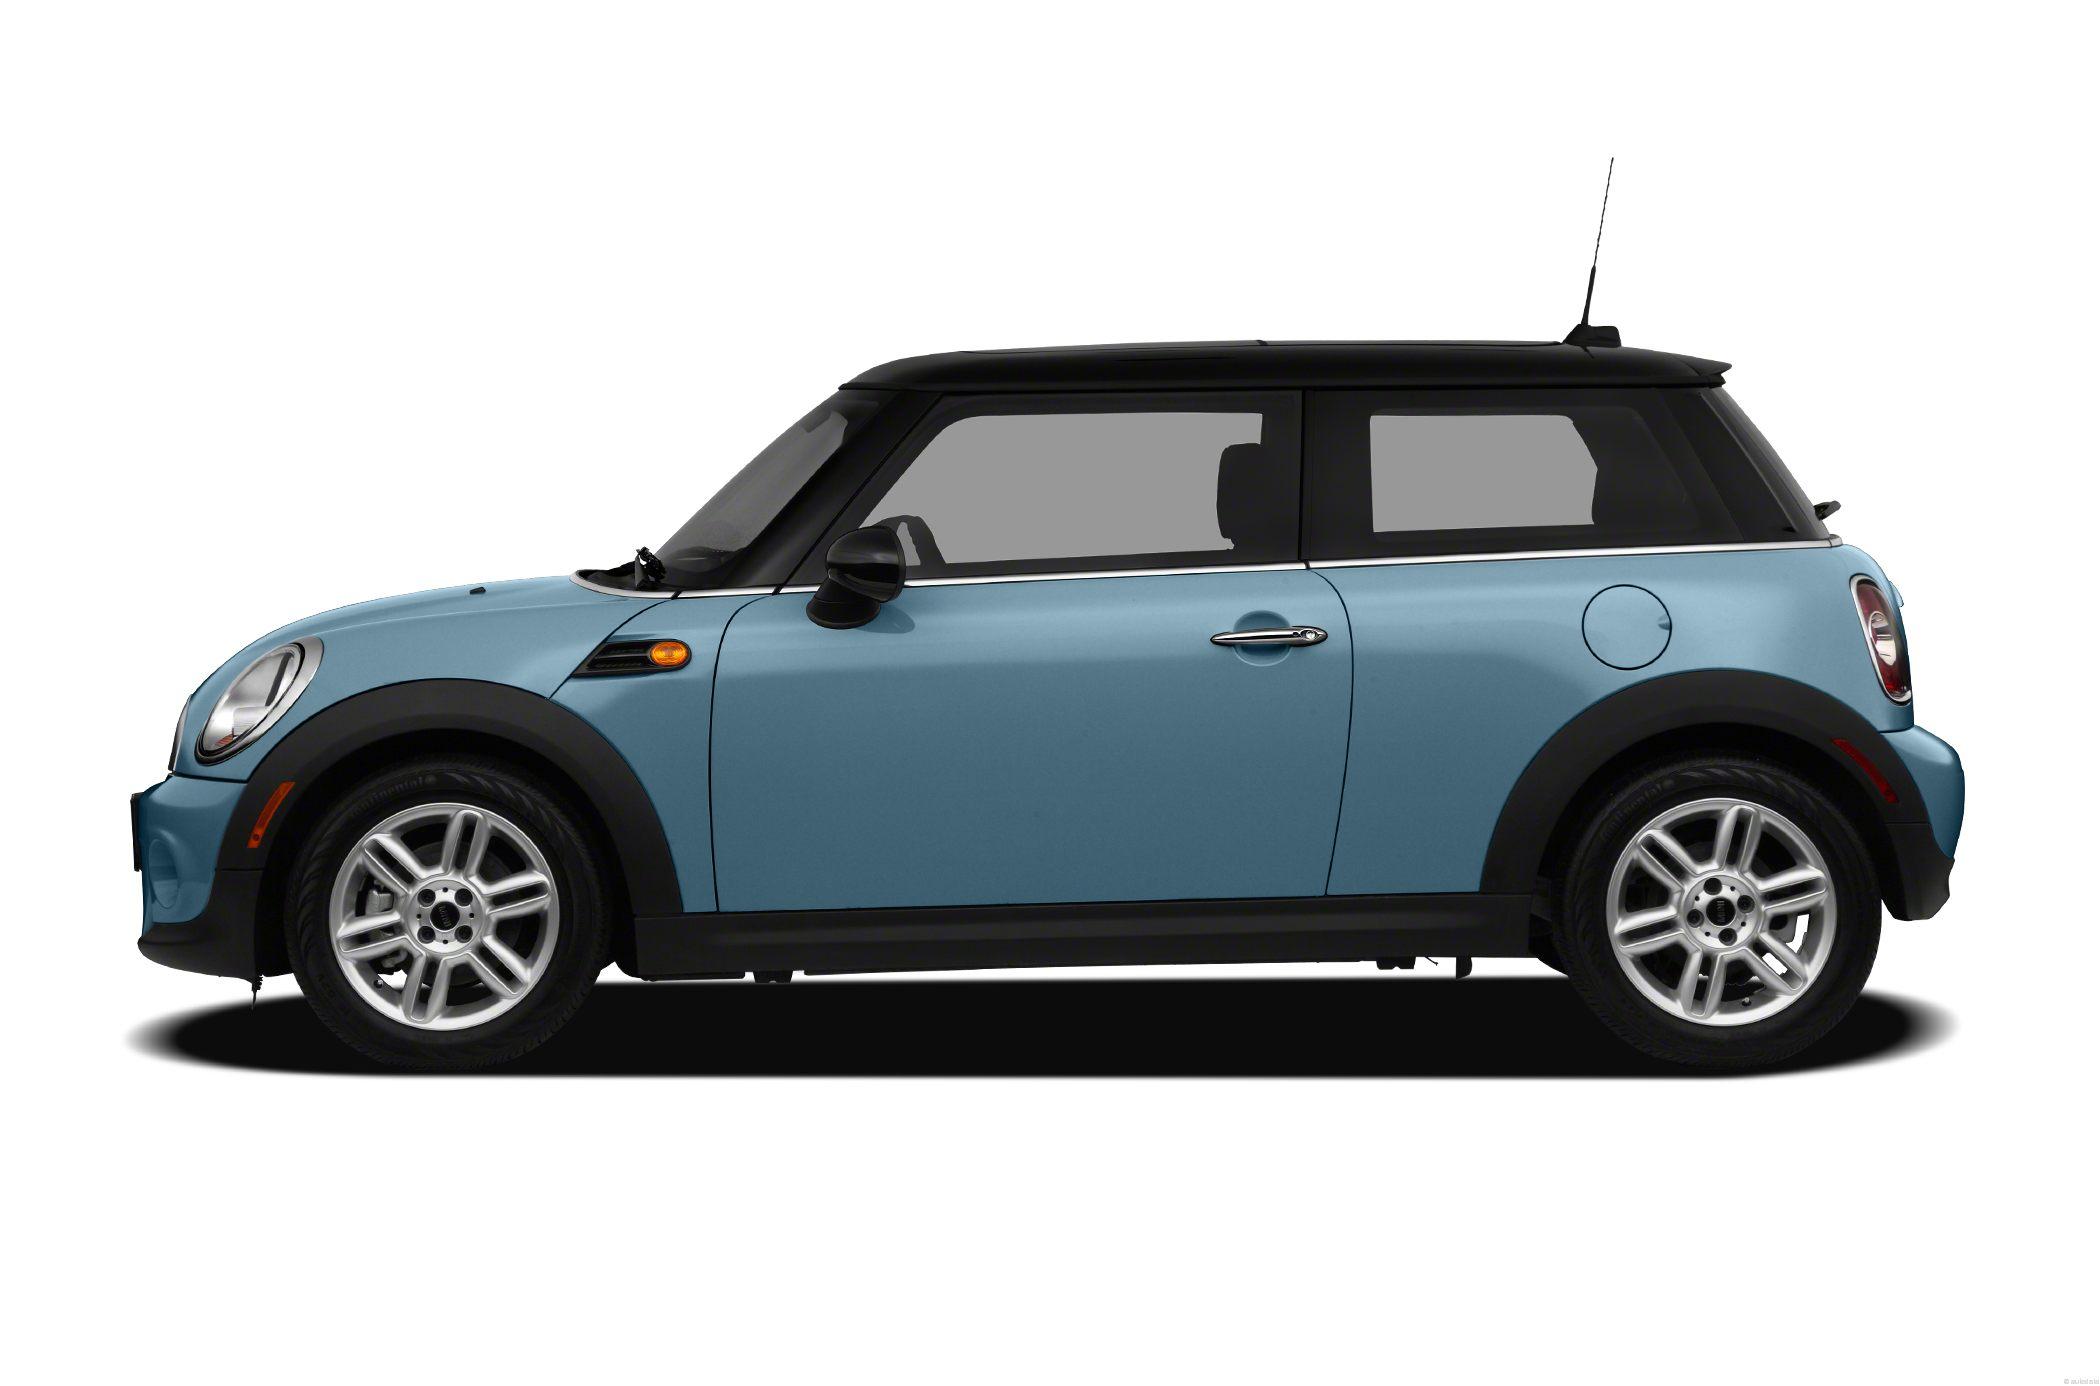 Mini Car Prices 4 Car Desktop Background